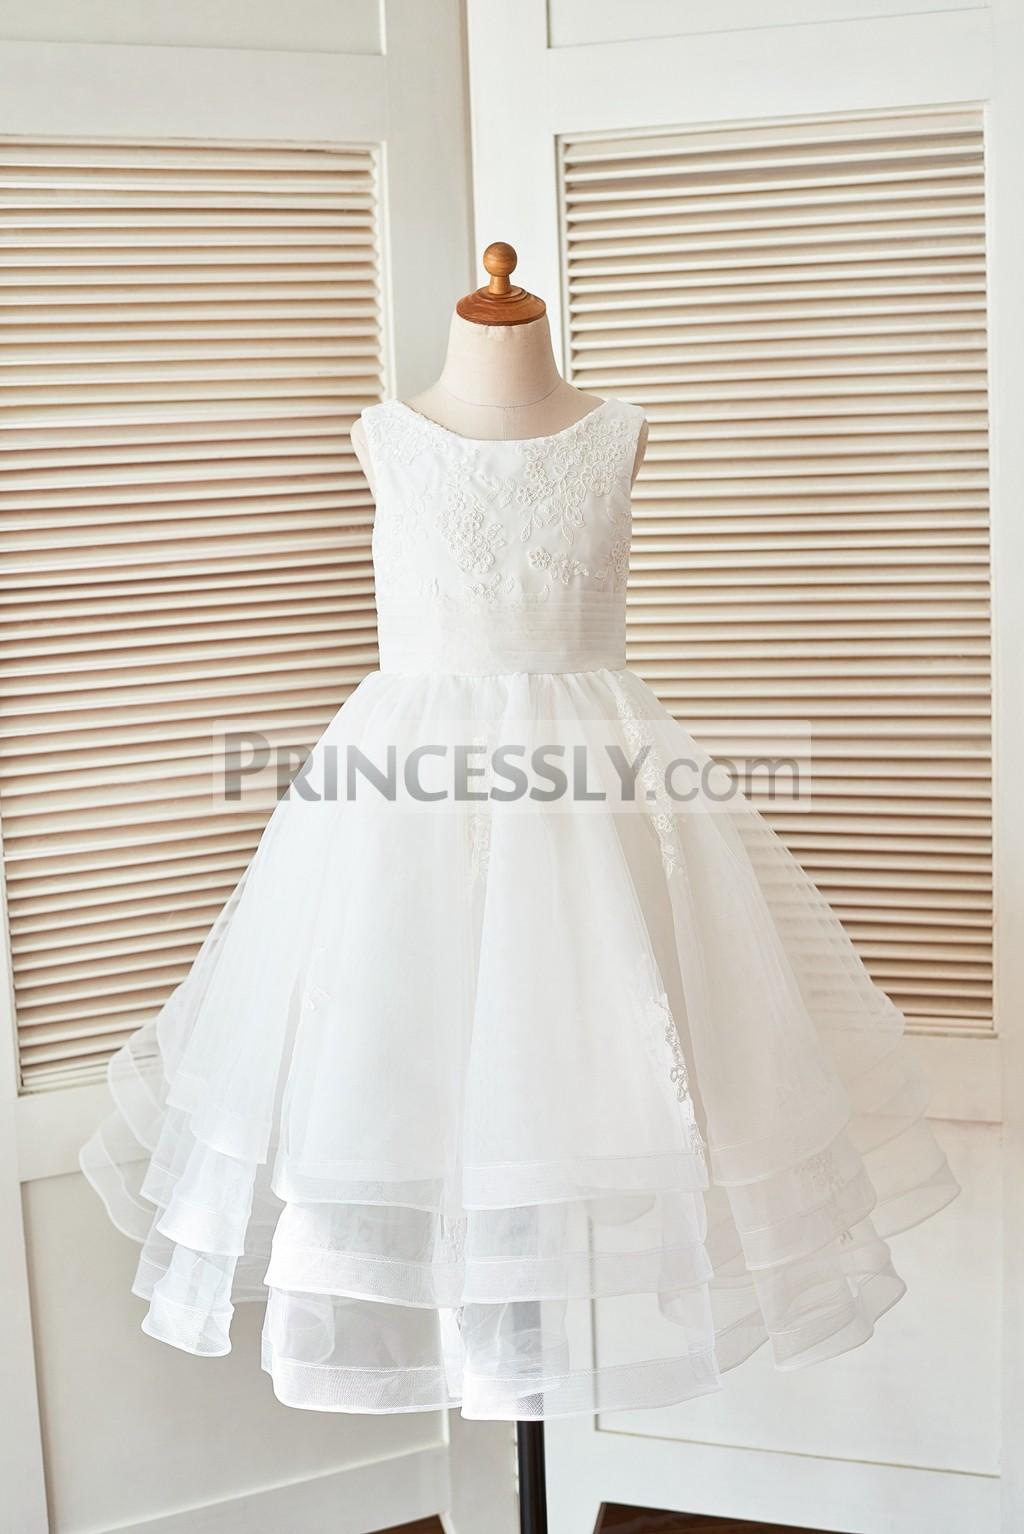 Princessly.com-K1003403 Cupcake Ivory Lace Tulle Wedding Flower Girl Dress with Horse Hair Tulle Hem-31